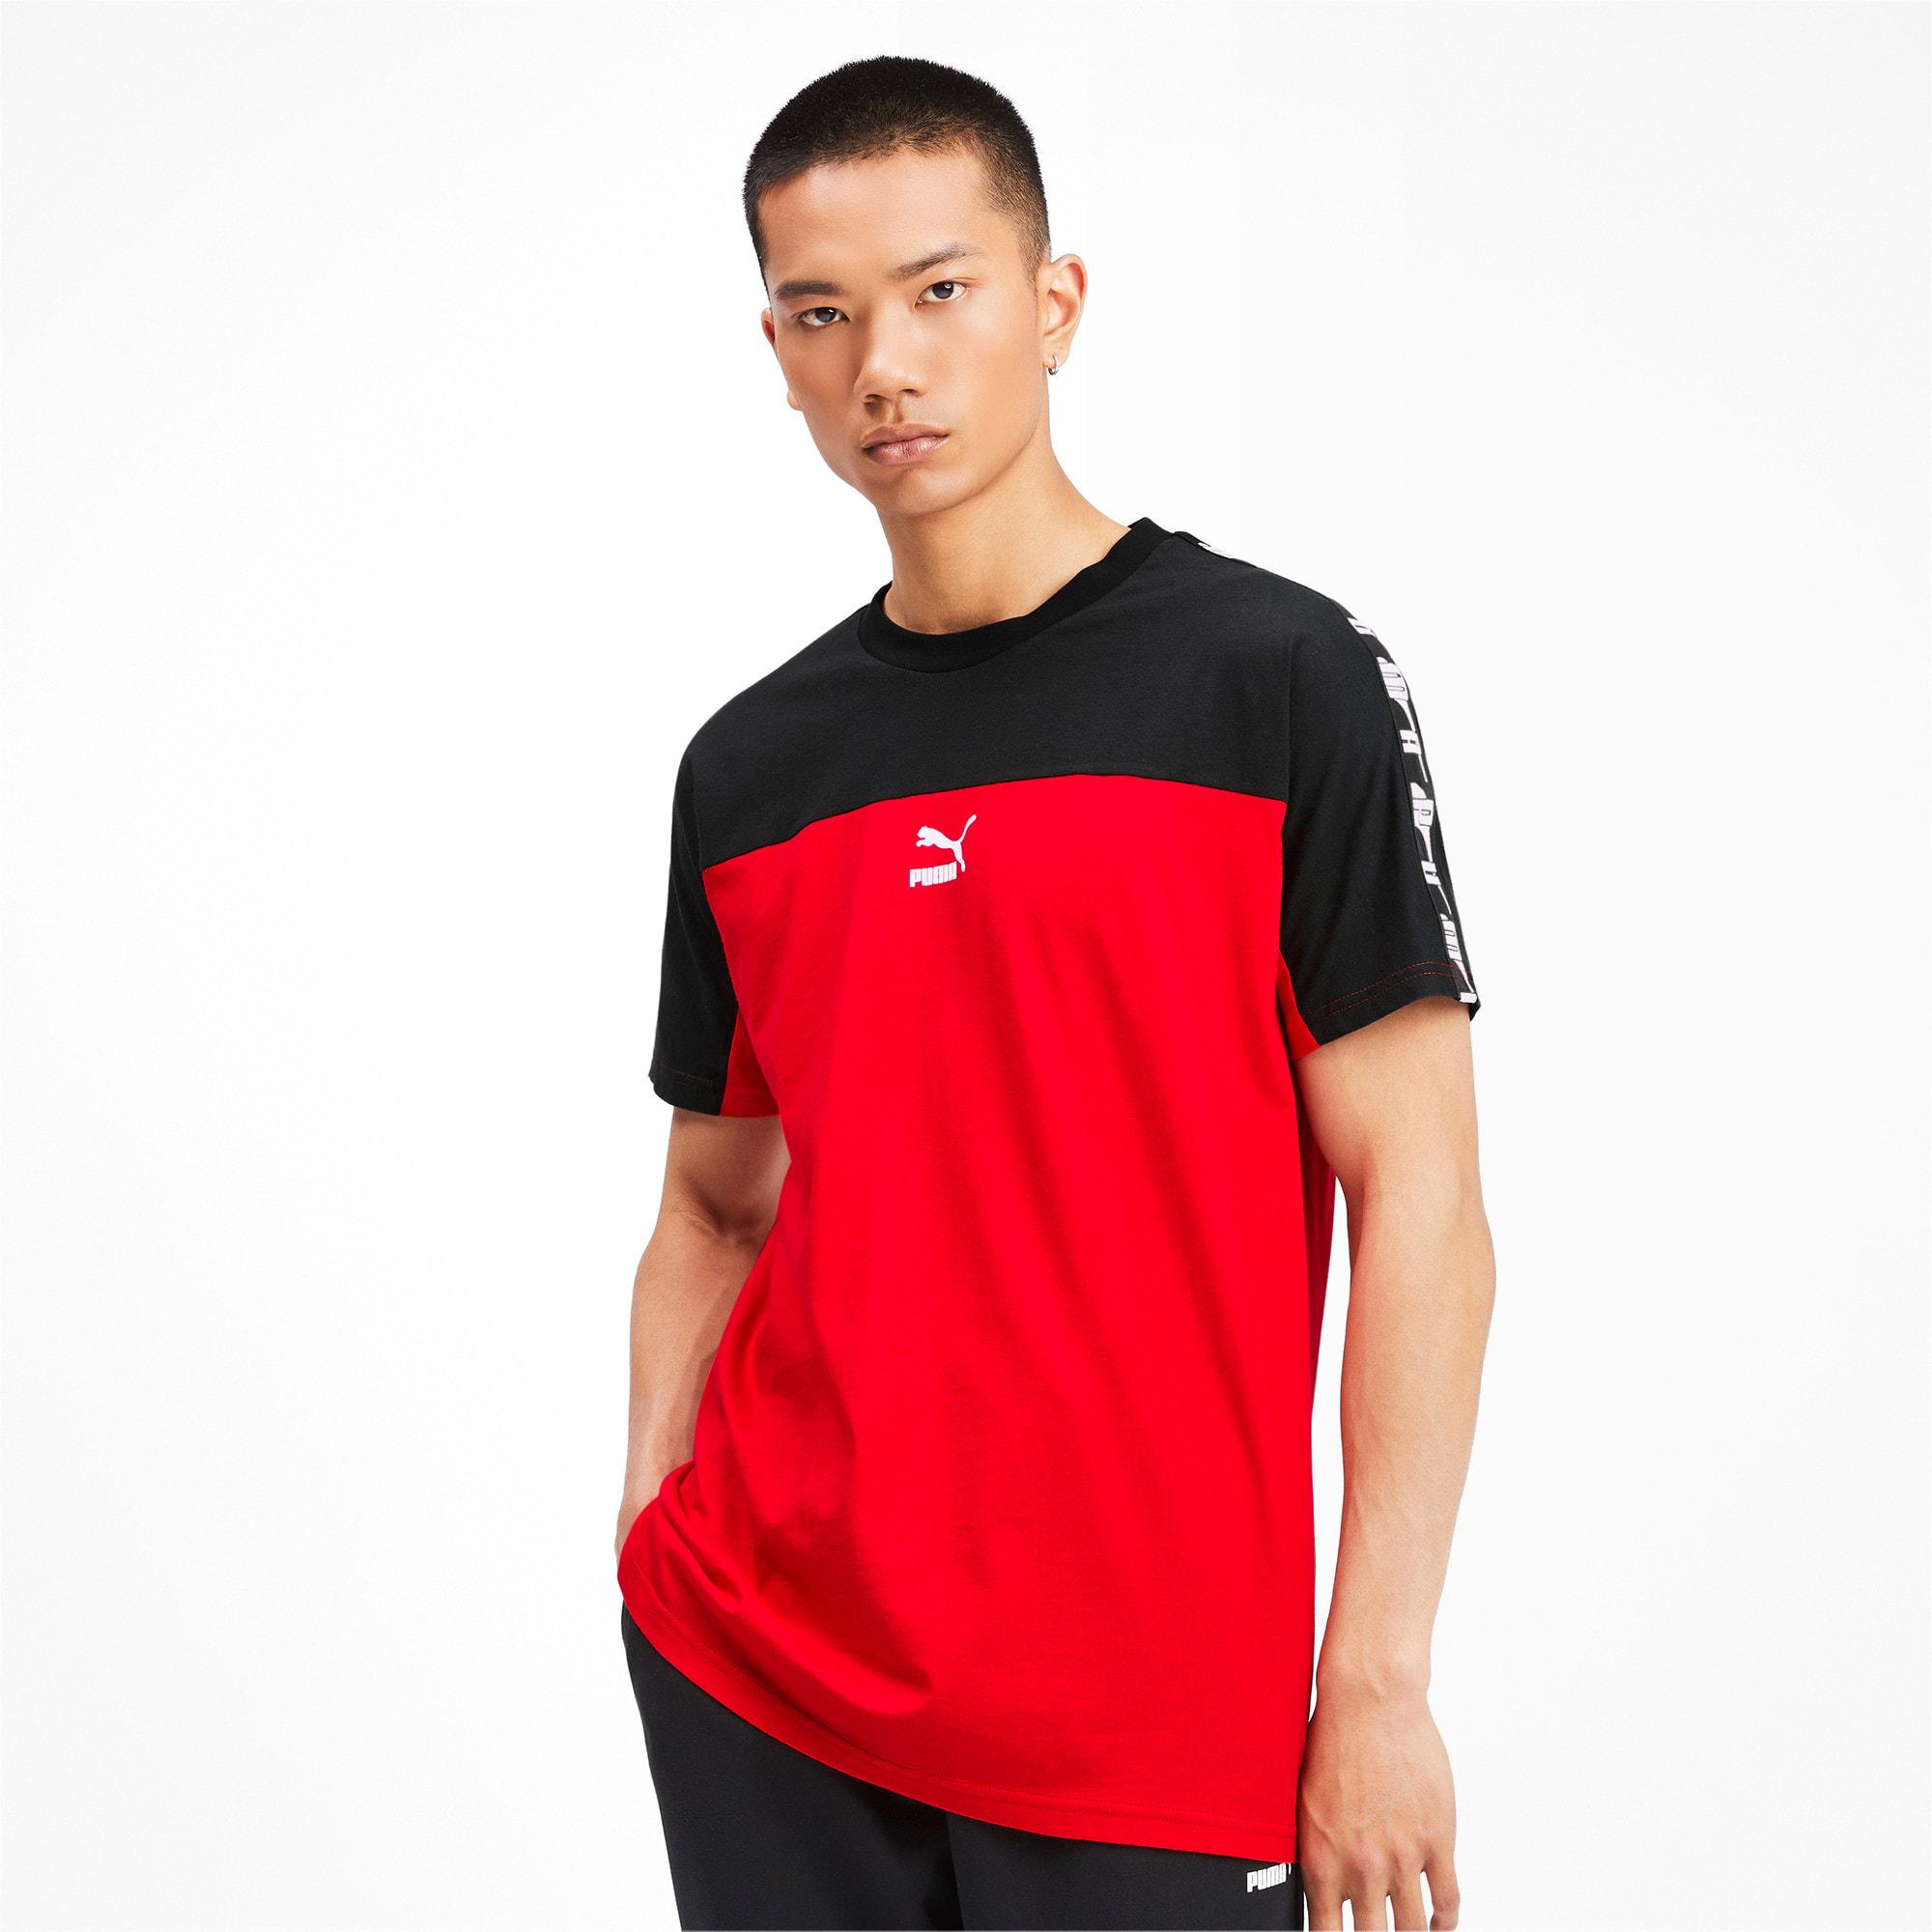 Thumbnail 2 of PUMA XTG SS Tシャツ, High Risk Red, medium-JPN